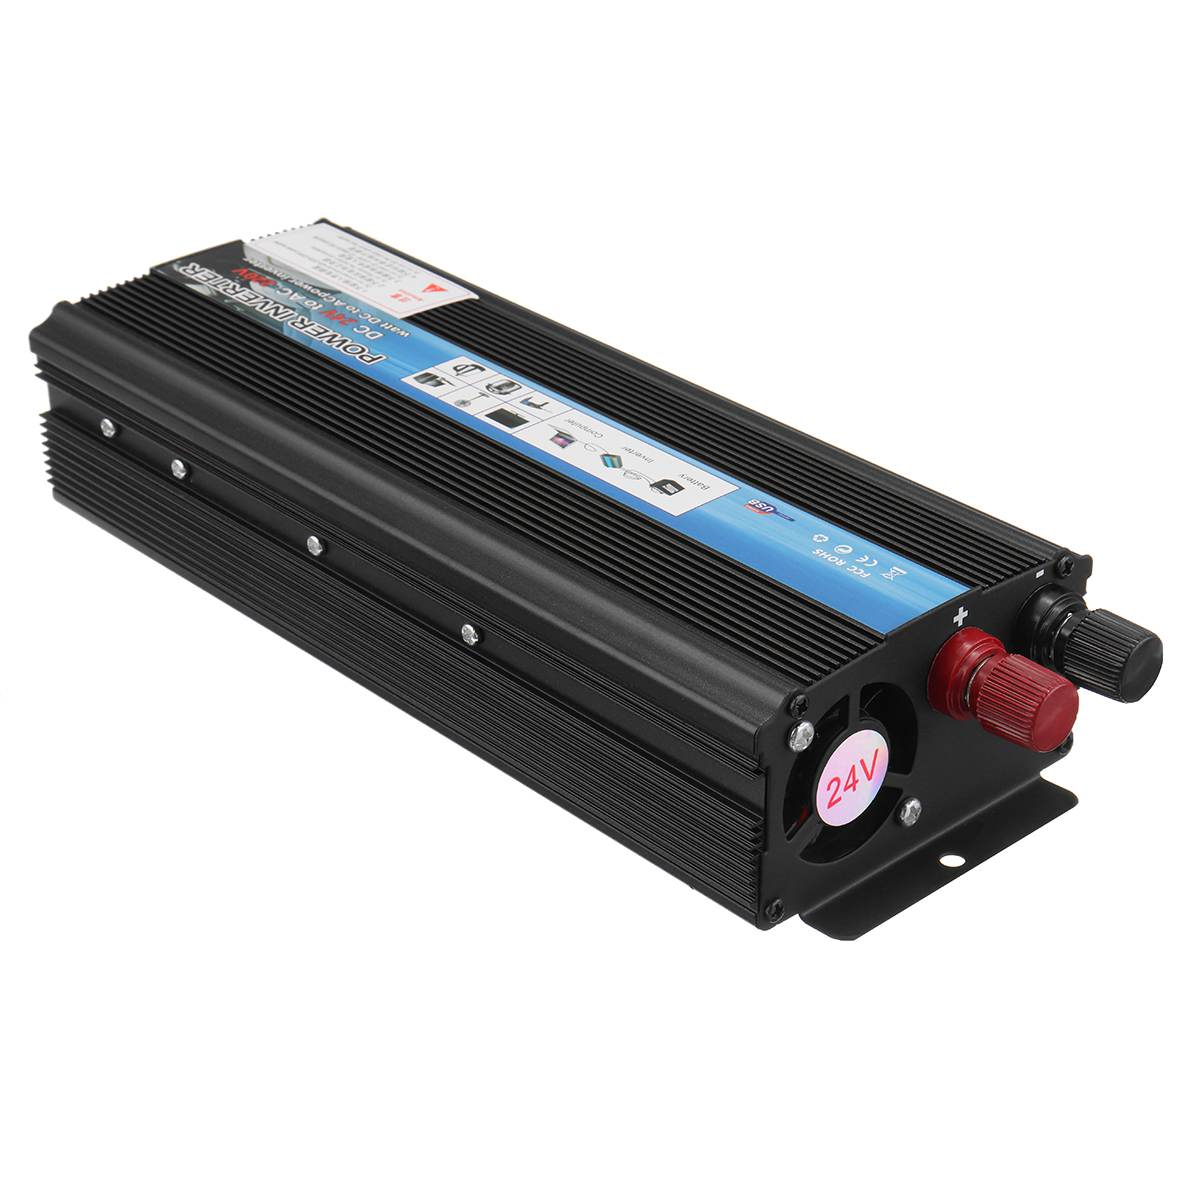 KROAK Car Inverter 12V 220V 5000W Pe ak Car Power Inverter Voltage Transformer Converter 12V To 220V Solar Inversor Black Style 3